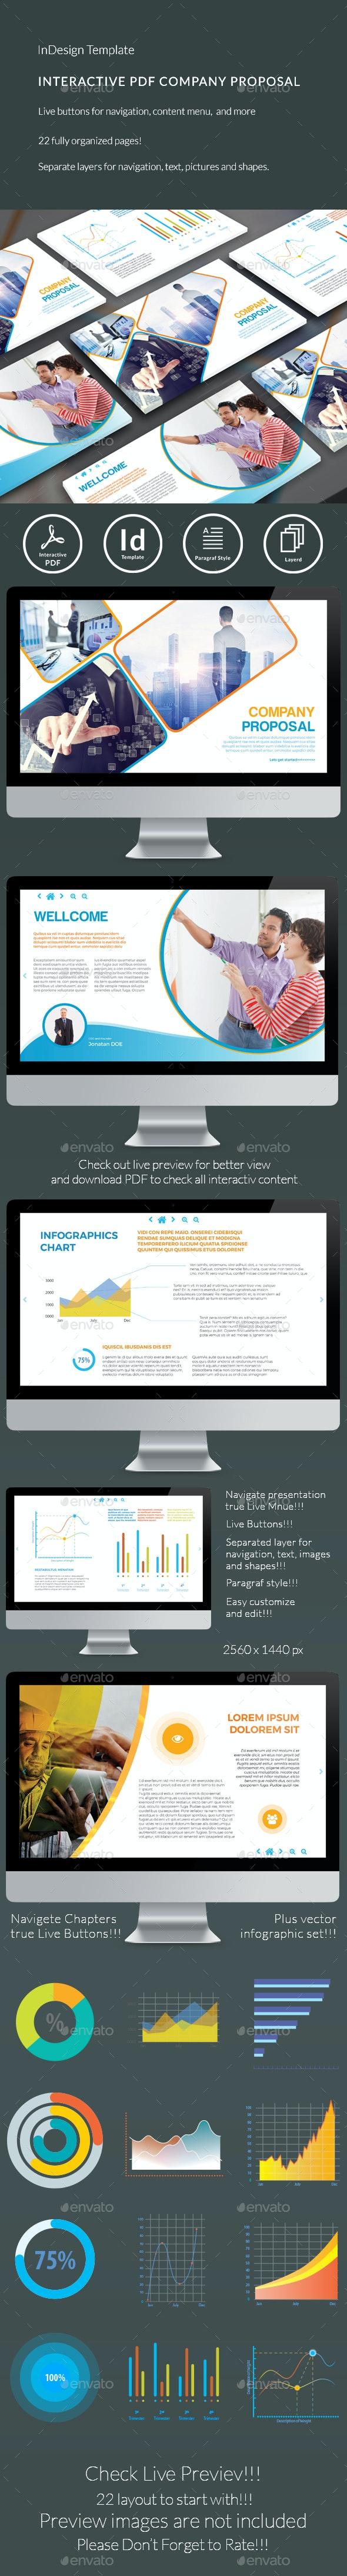 Interactive Company Proposal - ePublishing